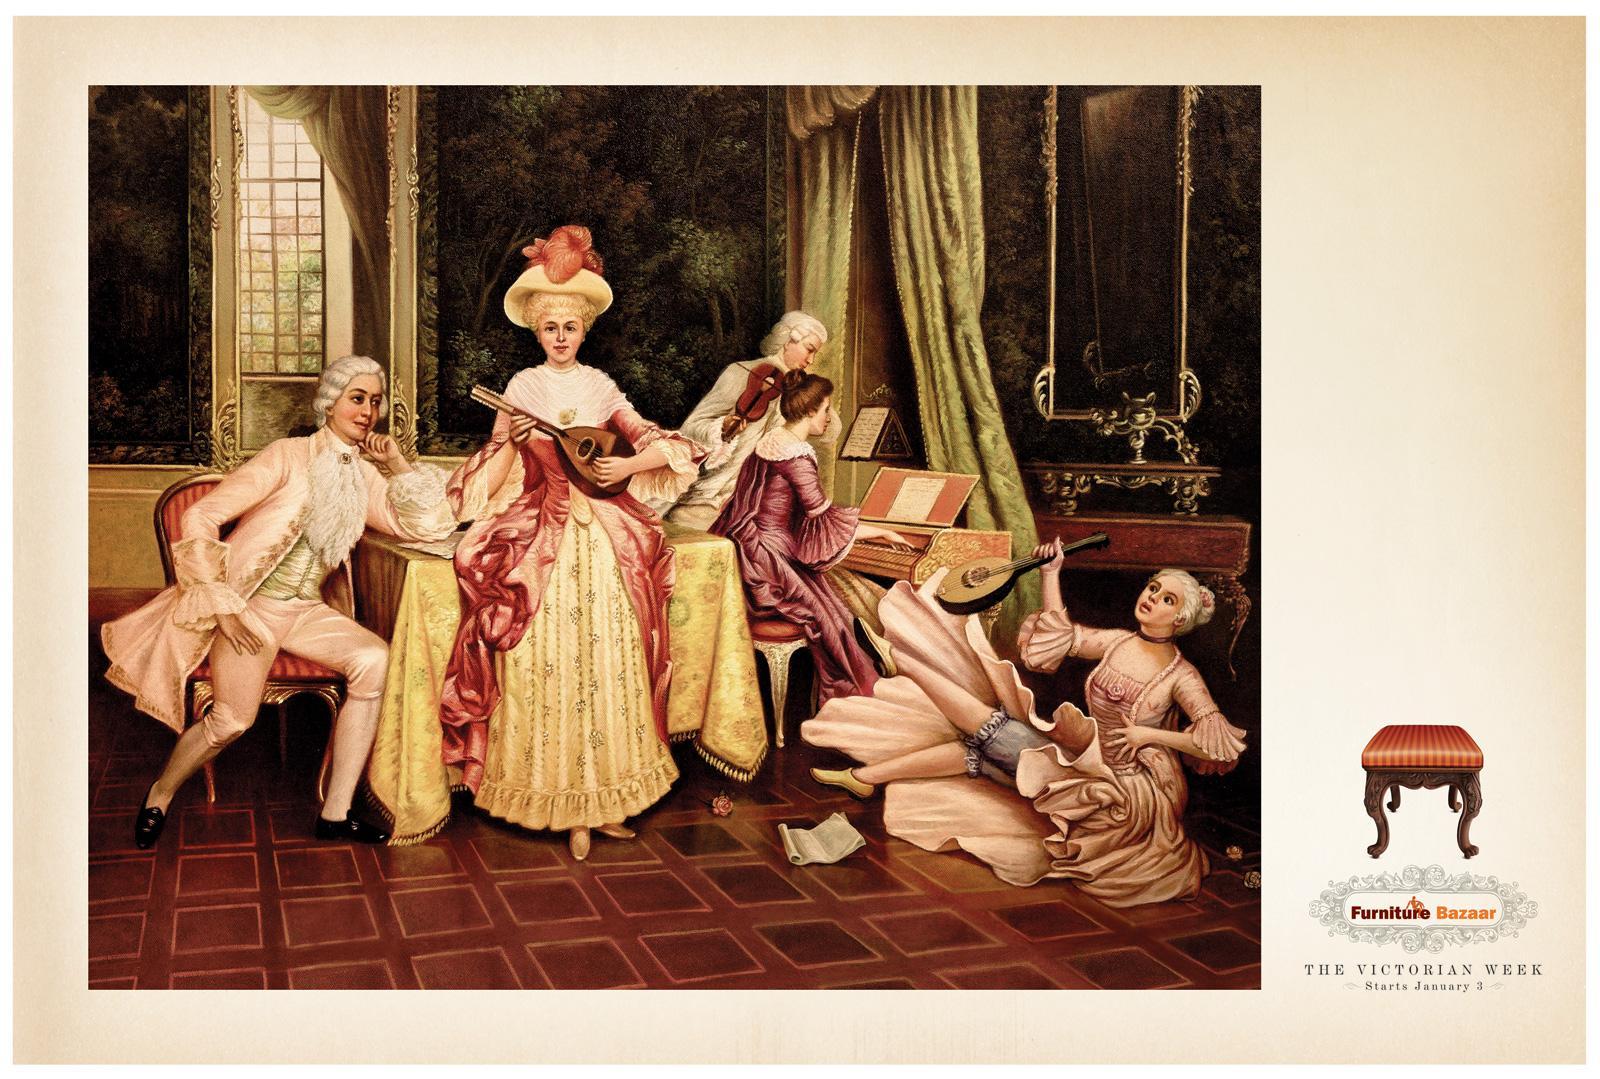 Furniture Bazaar Print Ad -  Victorian week, 3